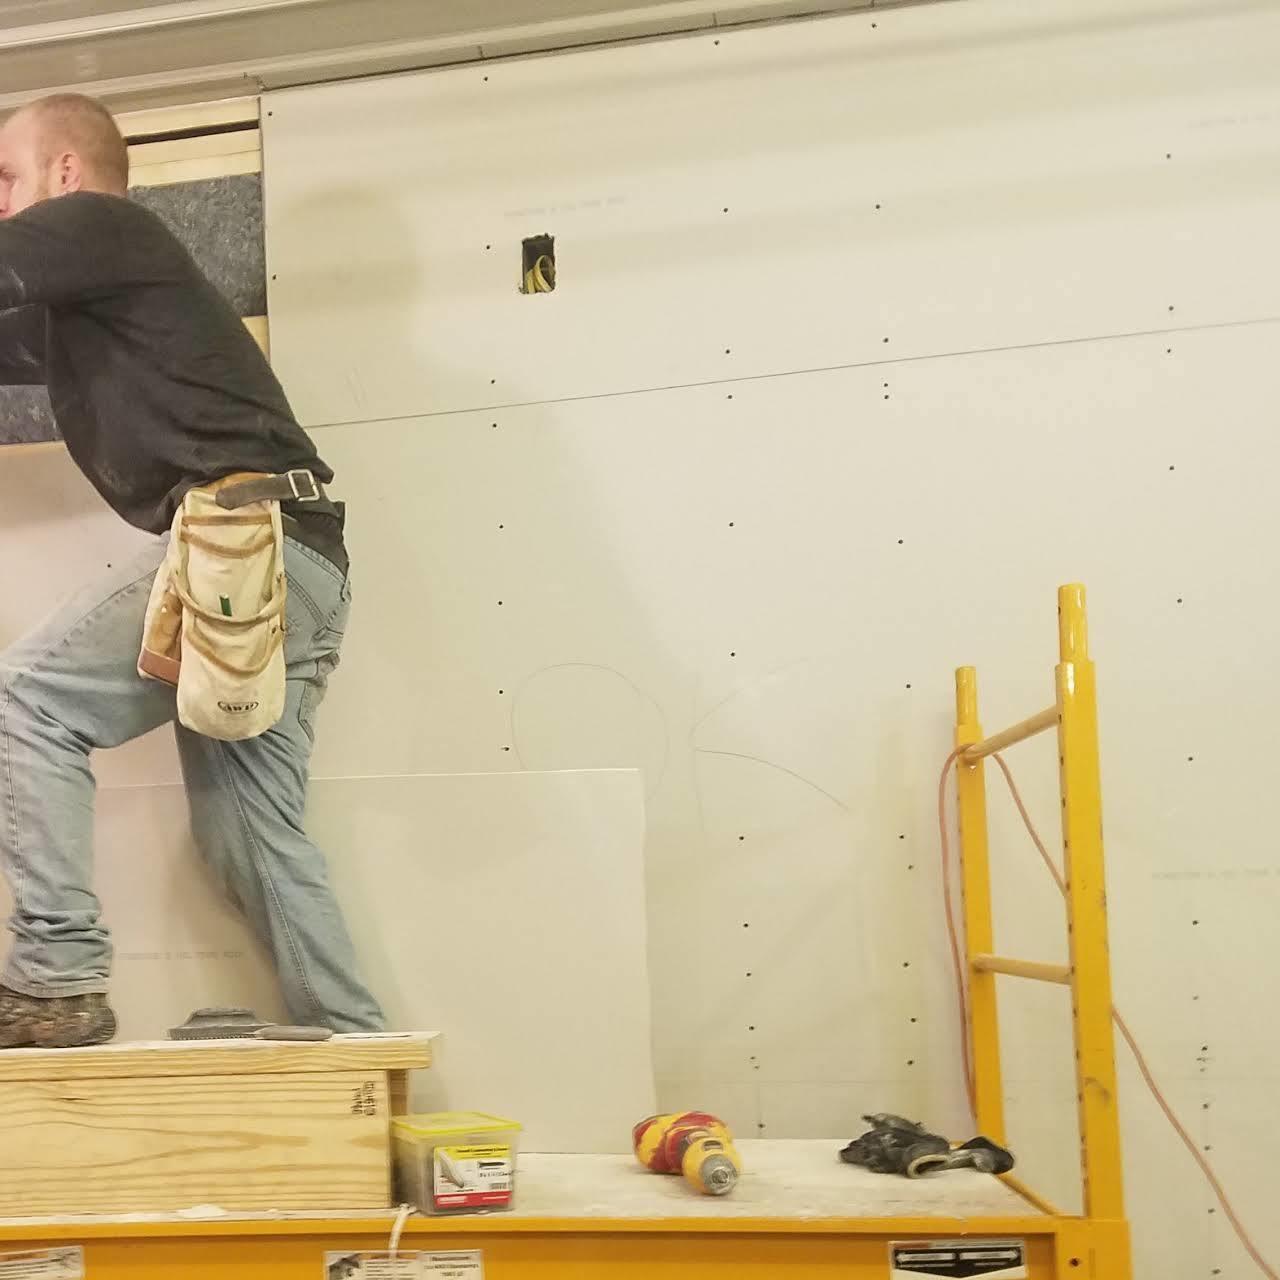 Peoria Tile and Carpenters image 31